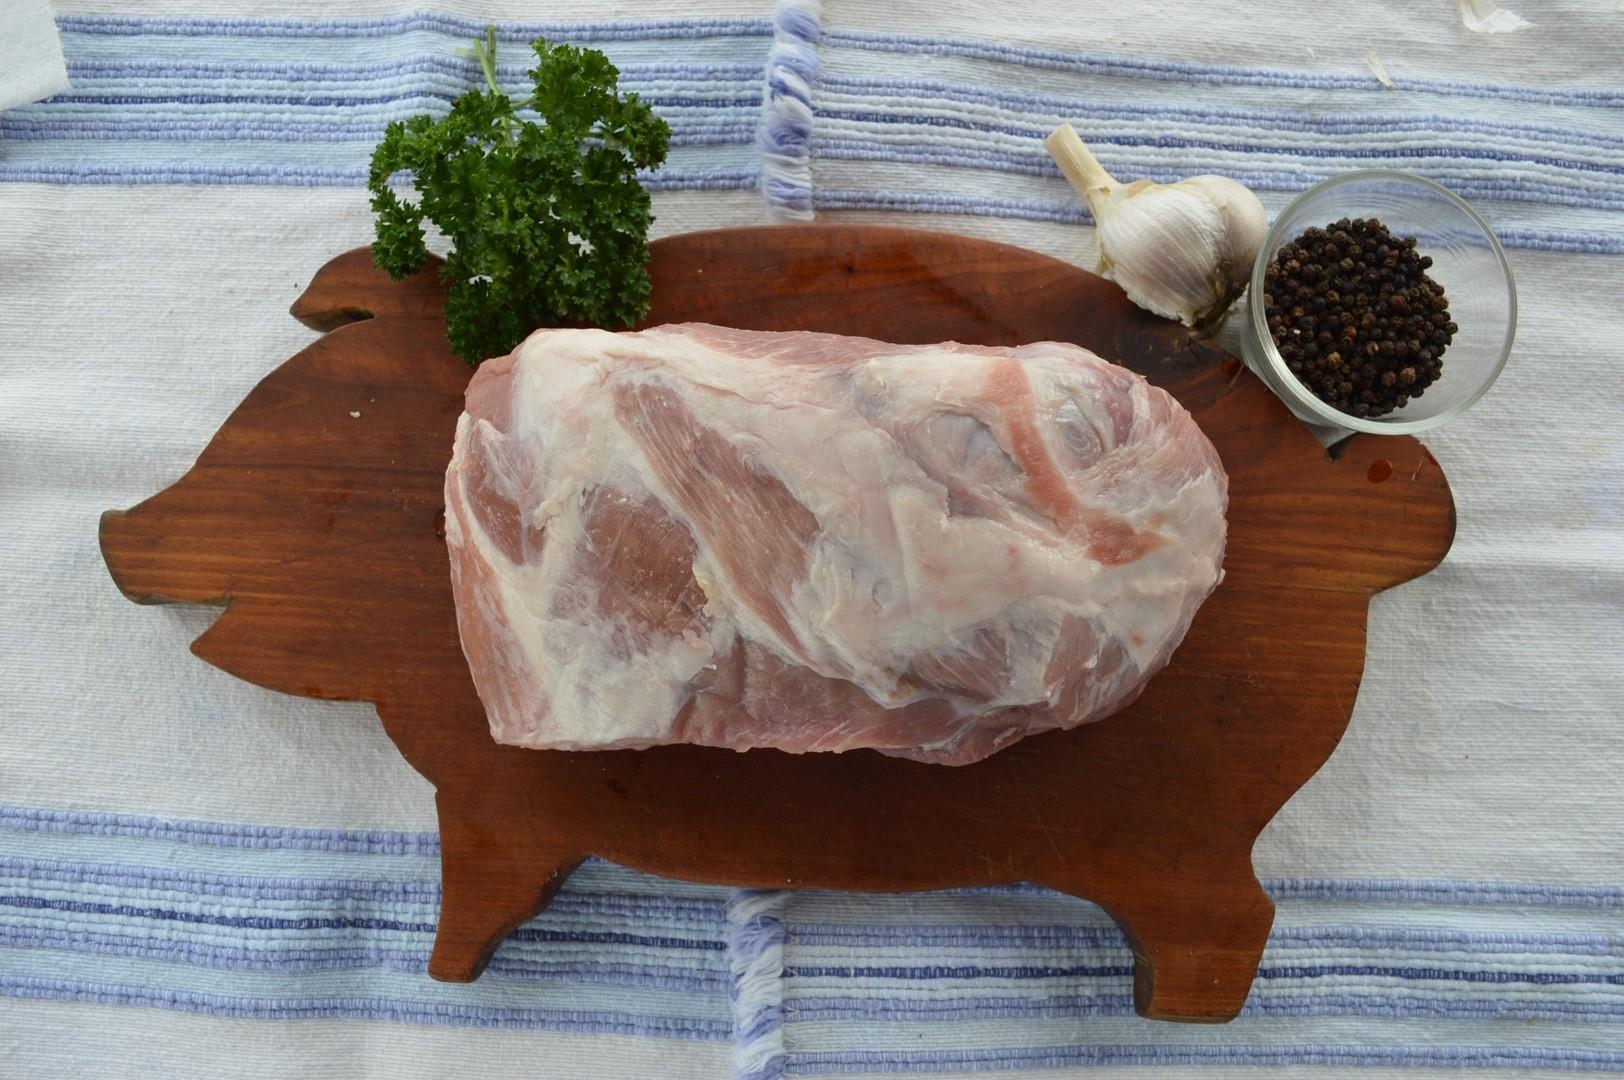 Pork Shoulder Roast (AKA Butt Roast)